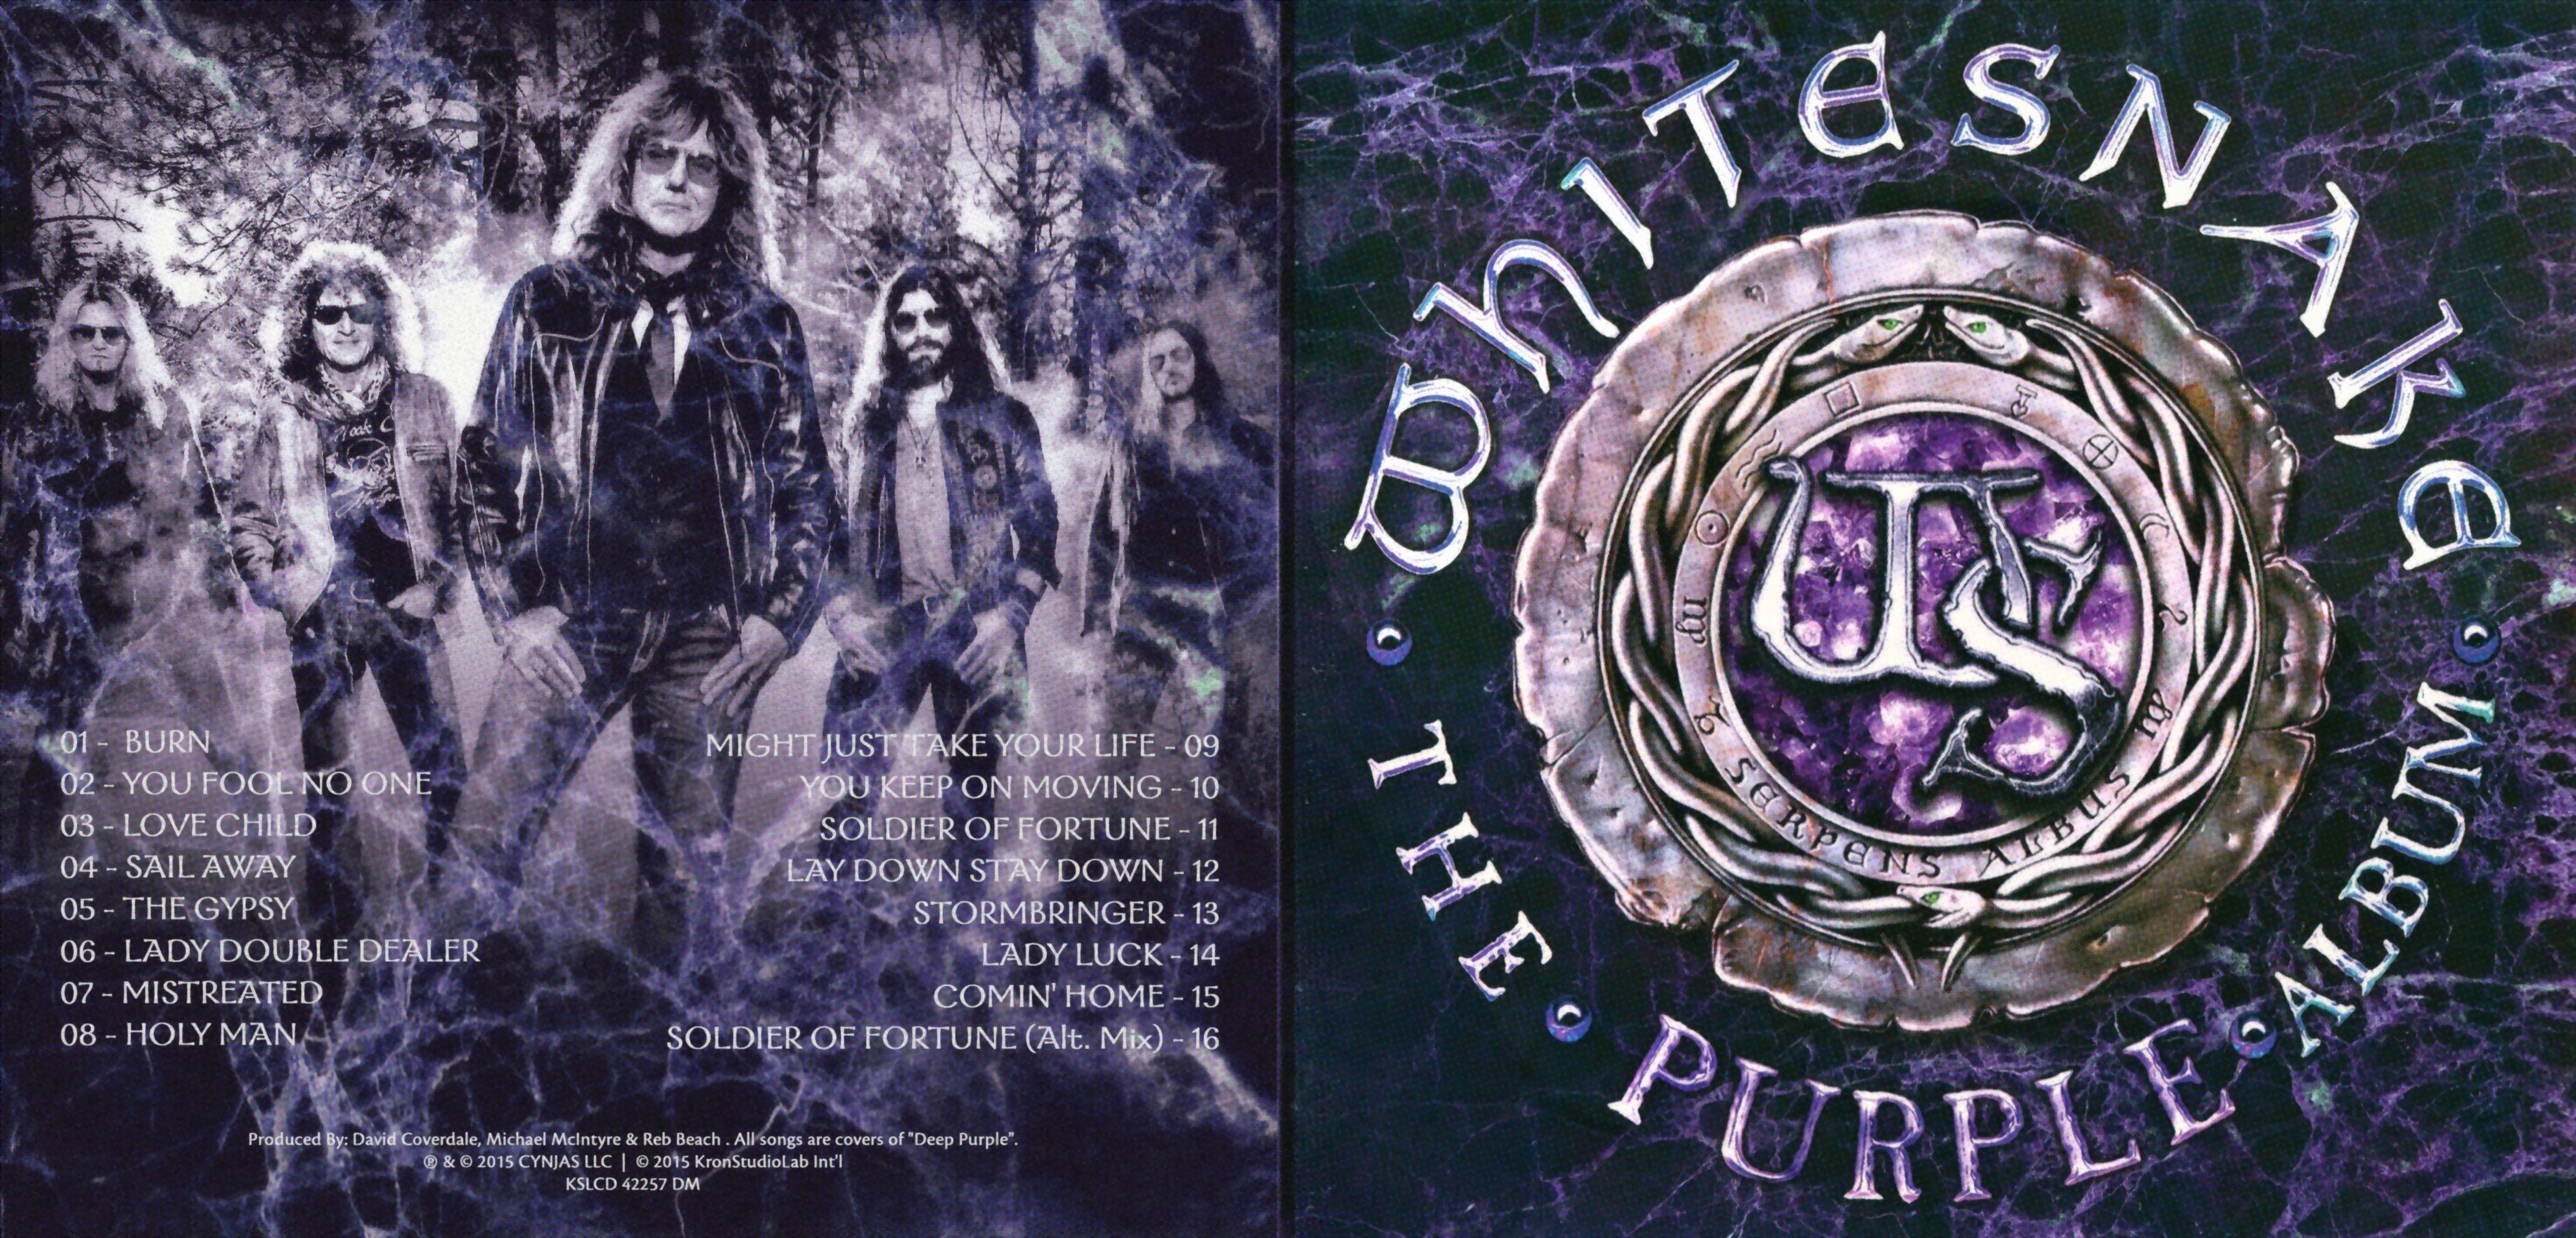 Whitesnake Deep Purple Album Coverdale Кавердейл пейзажи хард рок природы Сафиуллин